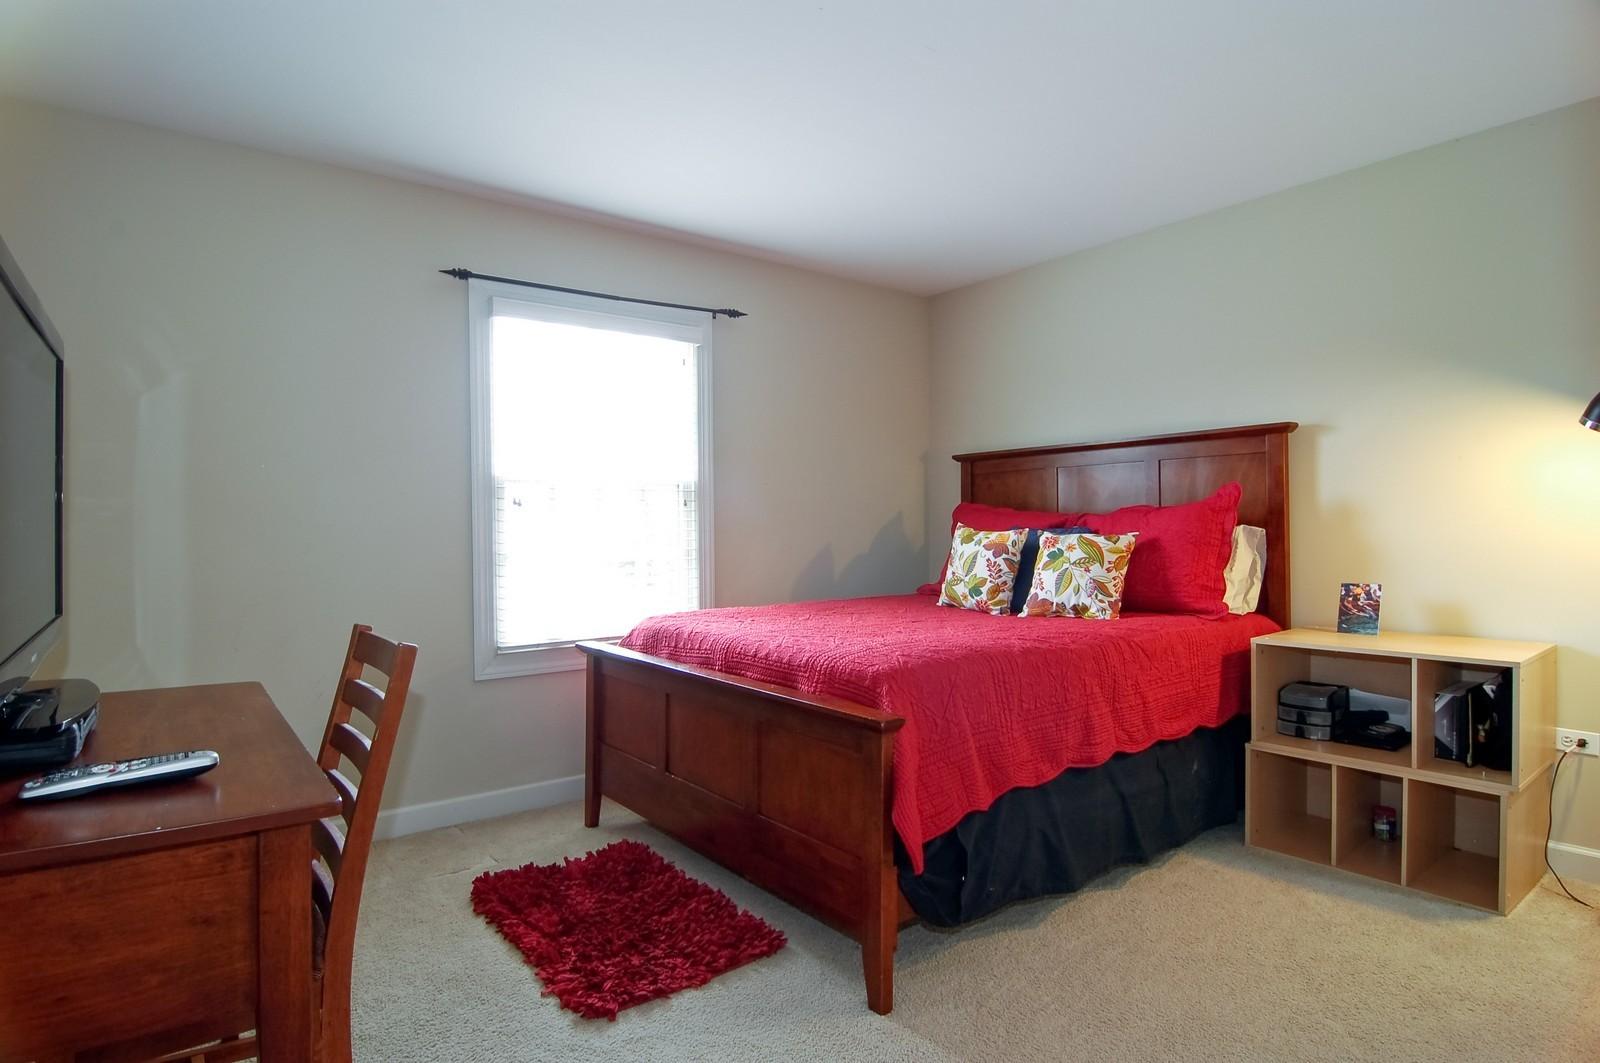 Real Estate Photography - 203 E. Lincoln, Wheaton, IL, 60187 - 3rd Bedroom (Jack and Jill)